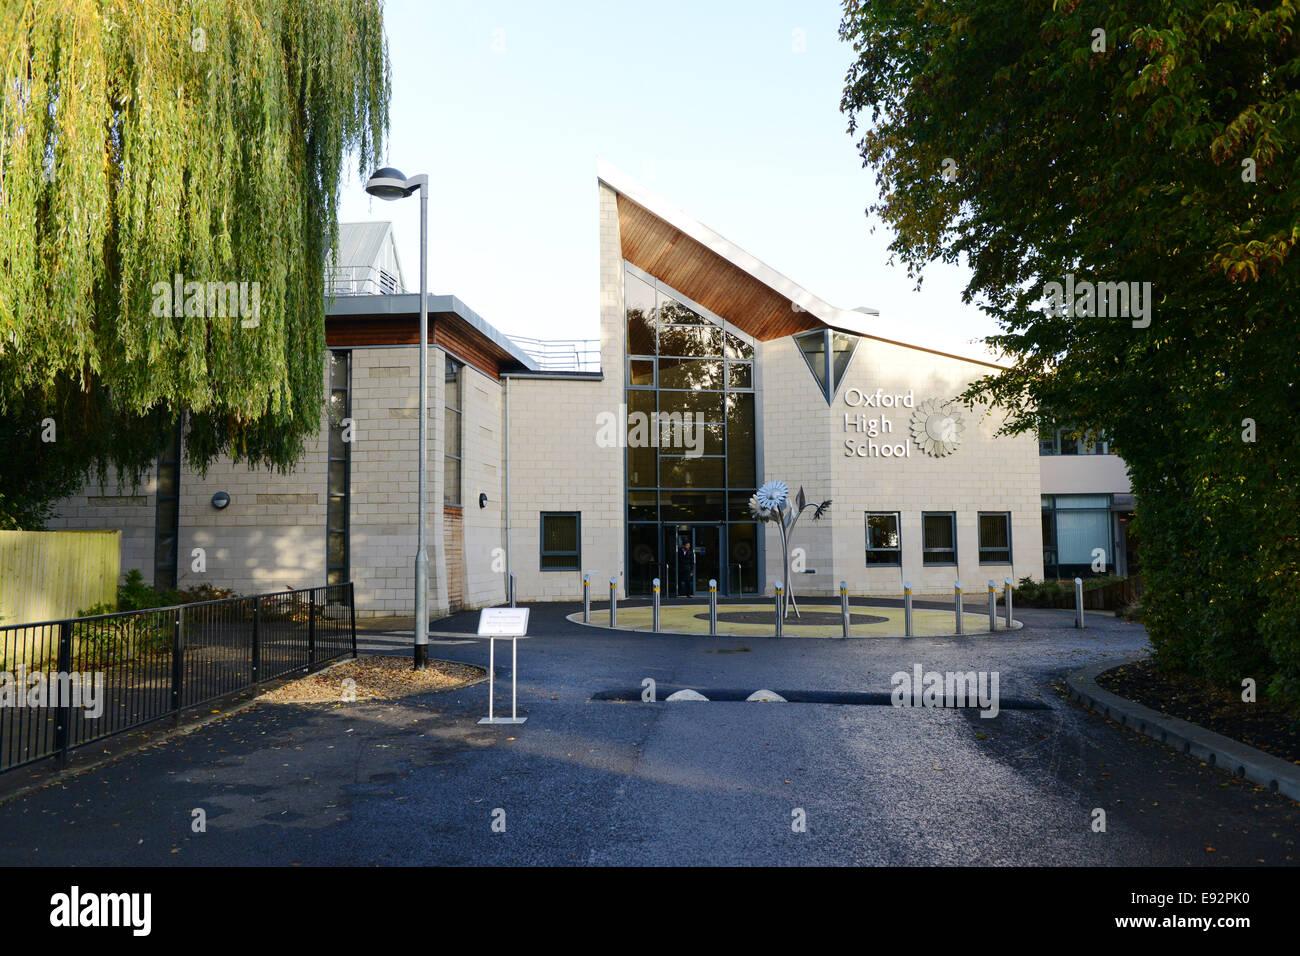 Oxford High School per ragazze, Belbroughton Rd GV Pic Richard Cave 17.10.14 Immagini Stock